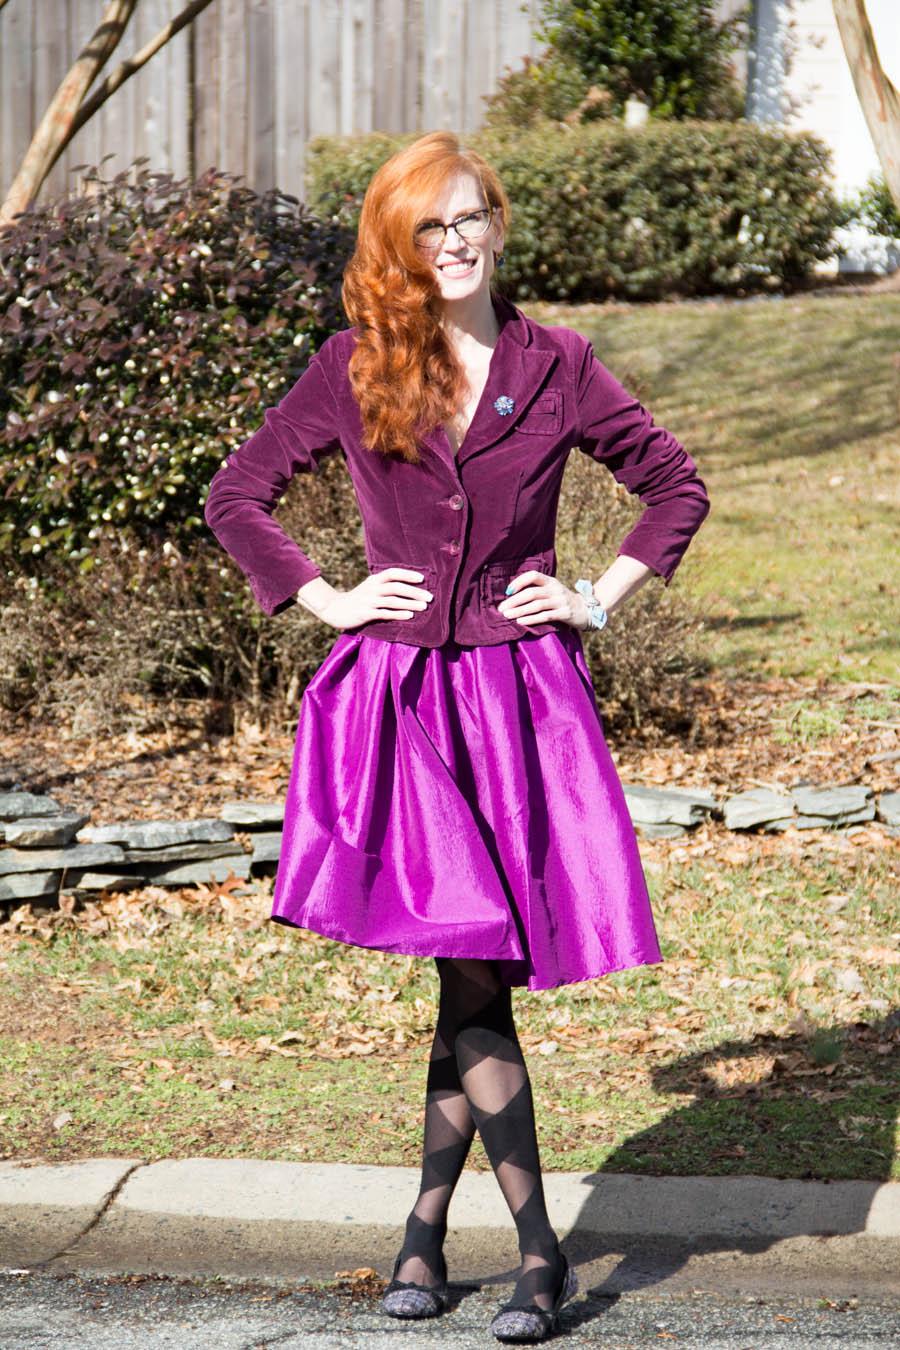 Velvet purple outfit